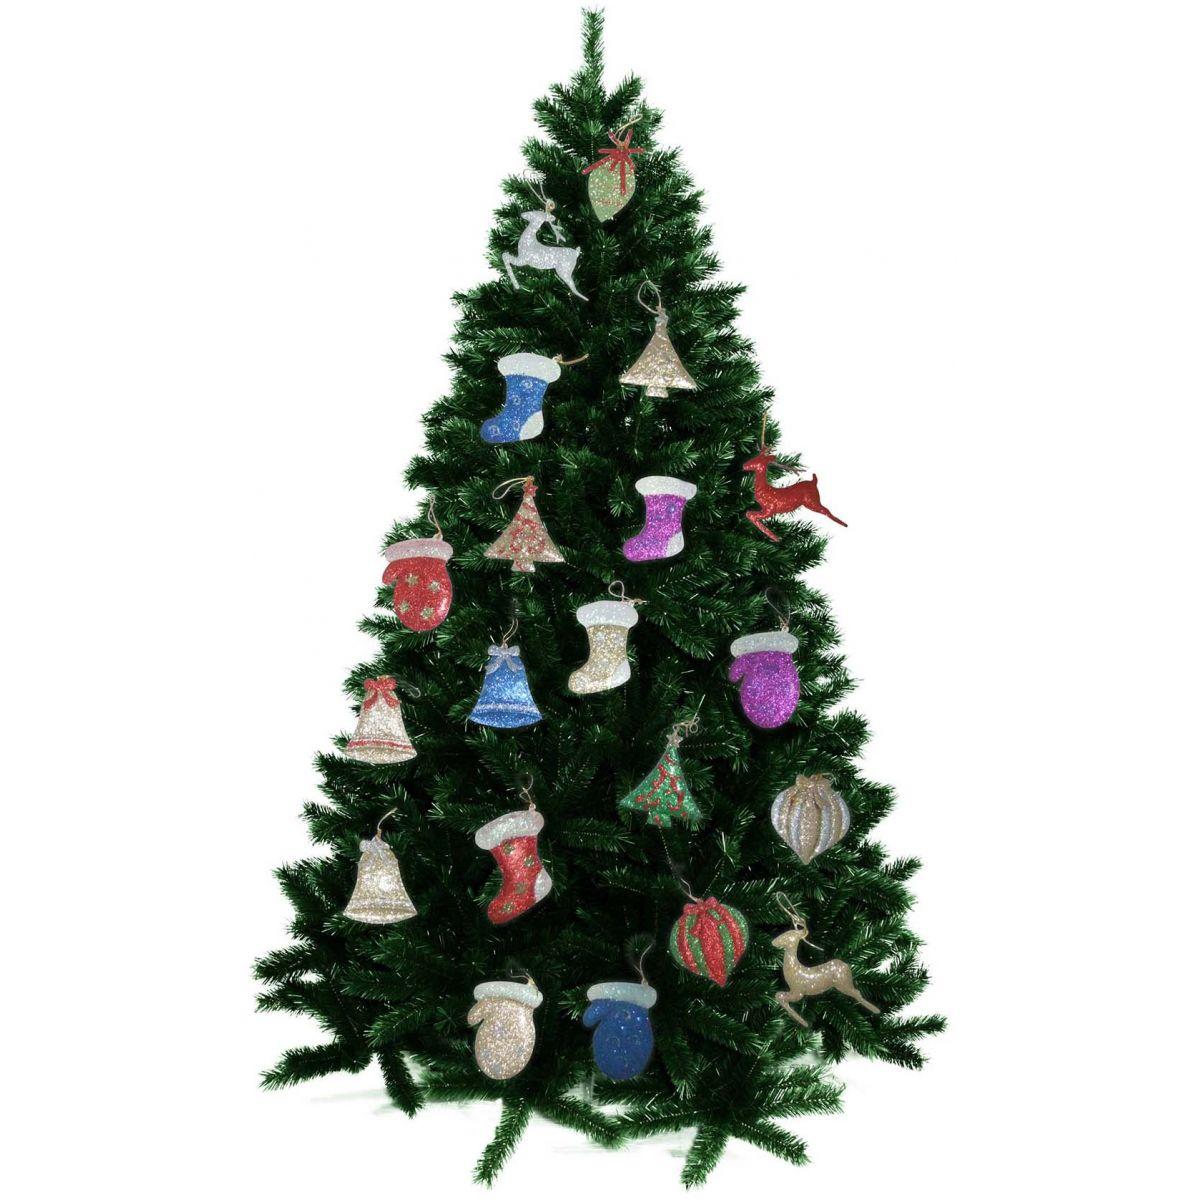 Kit Enfeites Natal Sortidos Coloridos Brilhantes Com Glitter 20 Unid